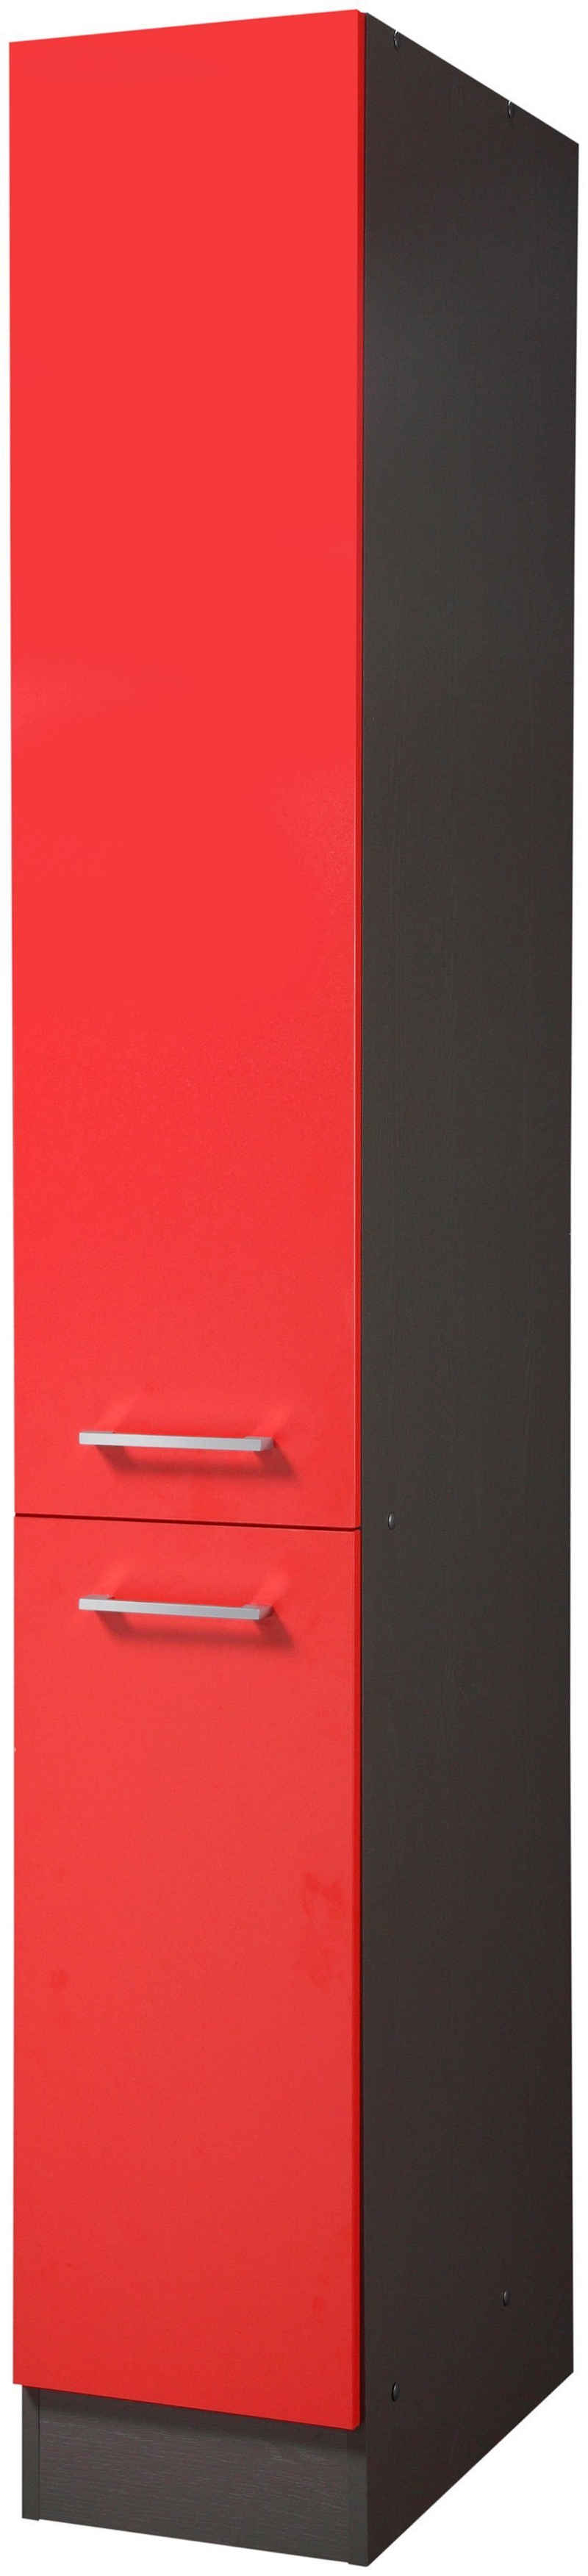 HELD MÖBEL Apothekerschrank »Paris« Breite 30 cm